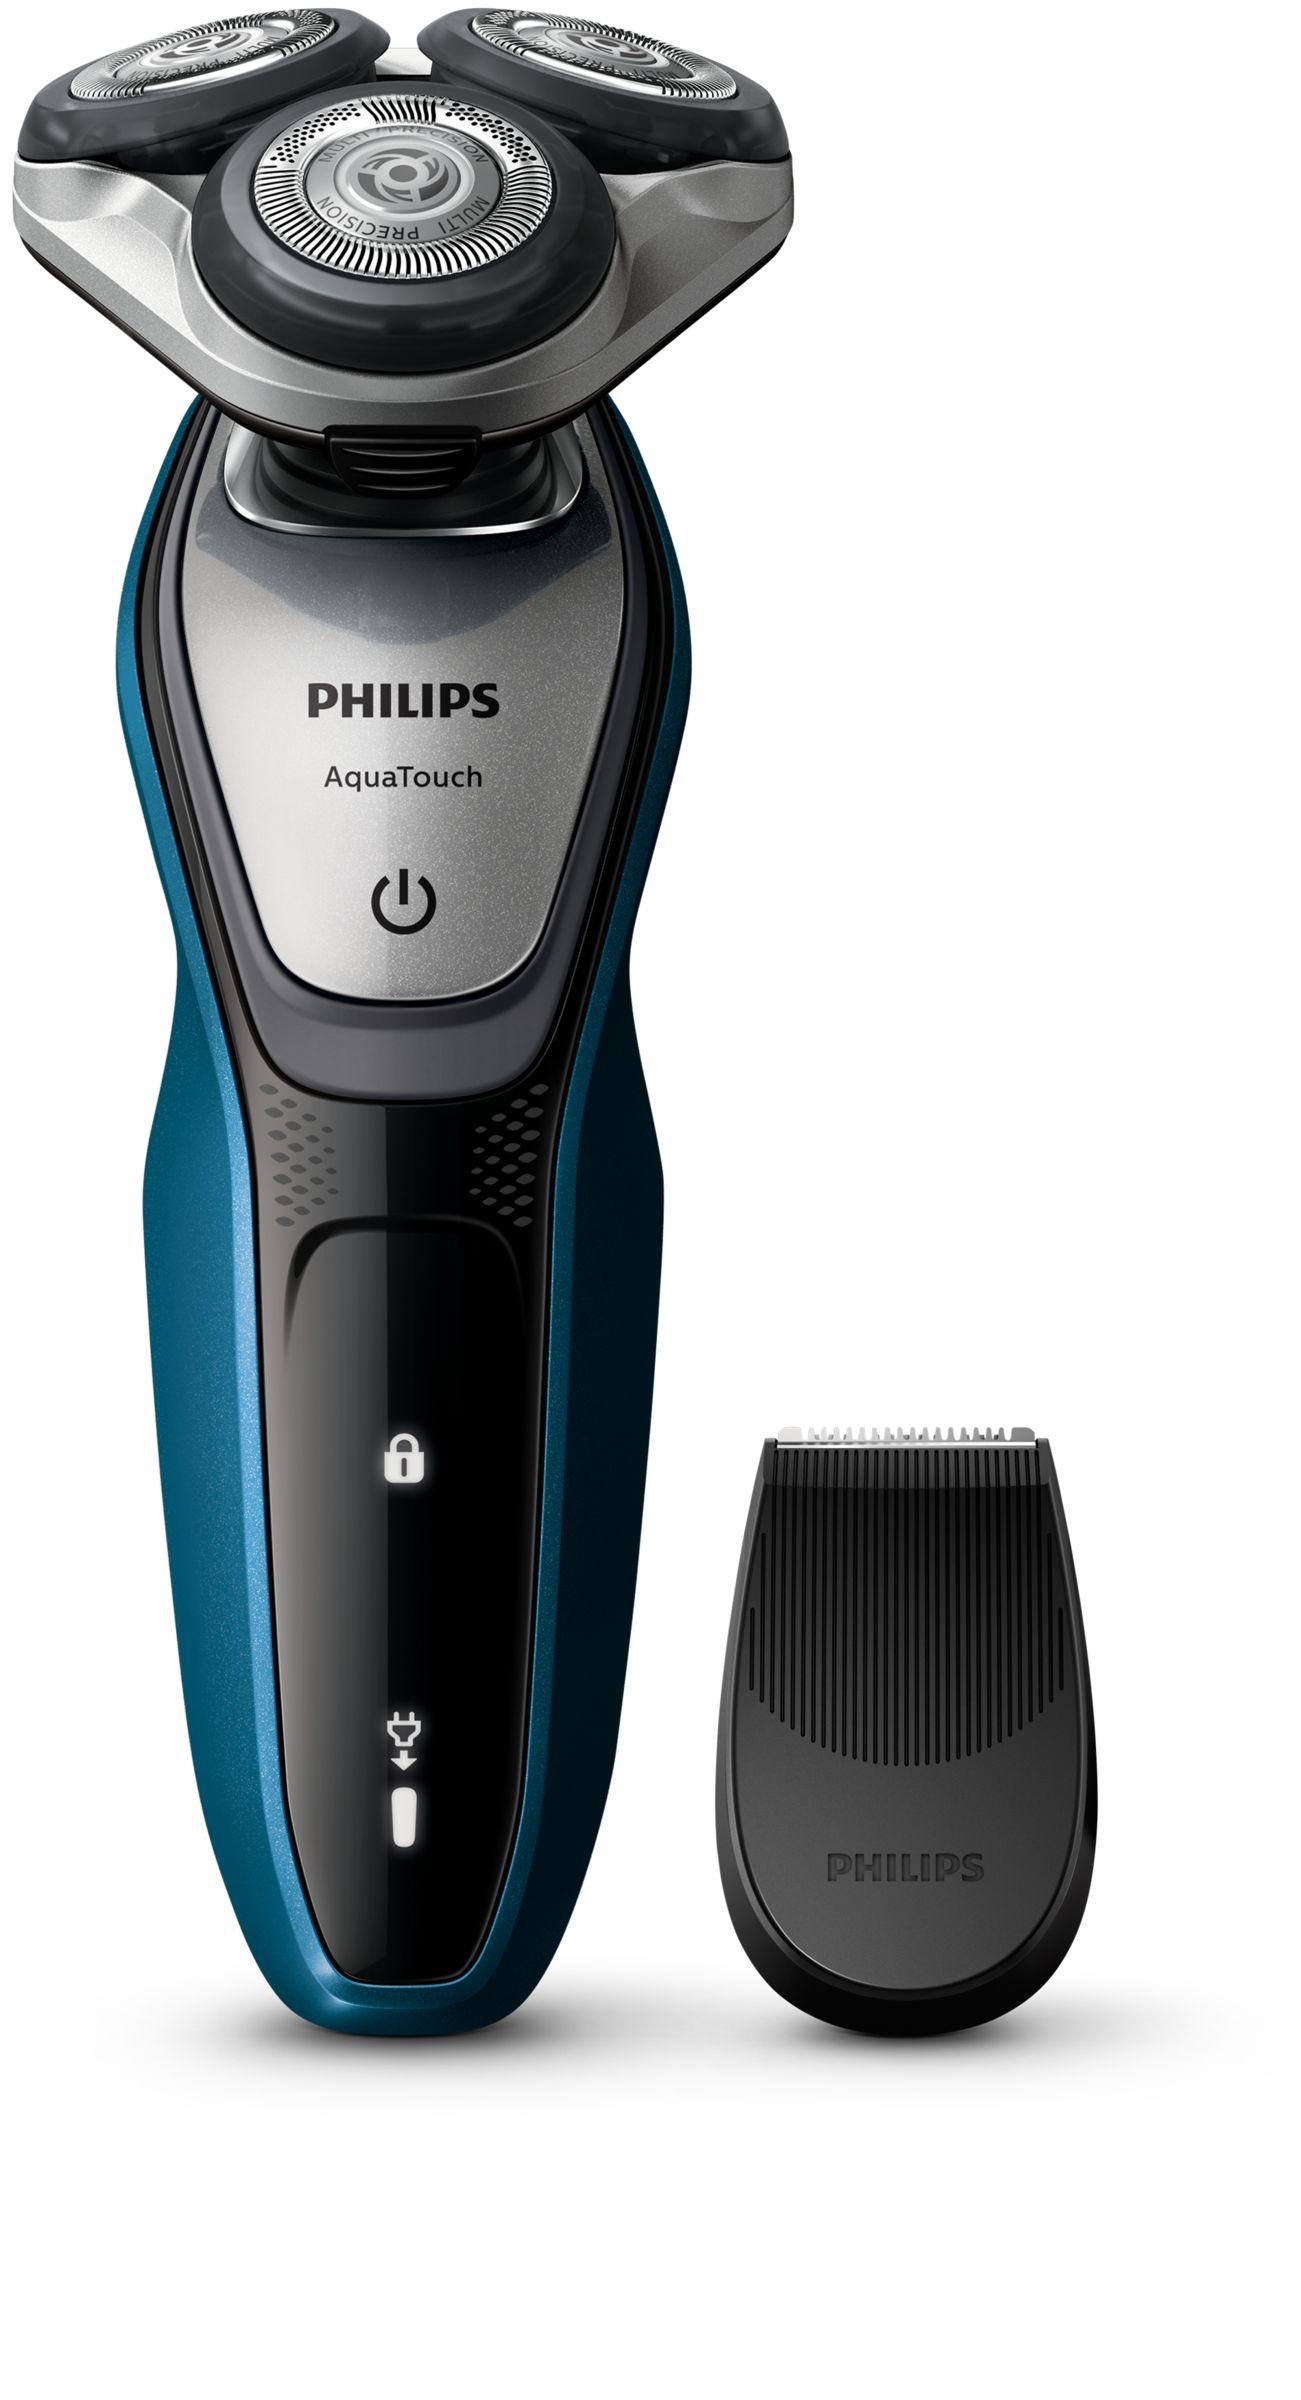 Philips AquaTouch Rasoio elettrico Wet & Dry